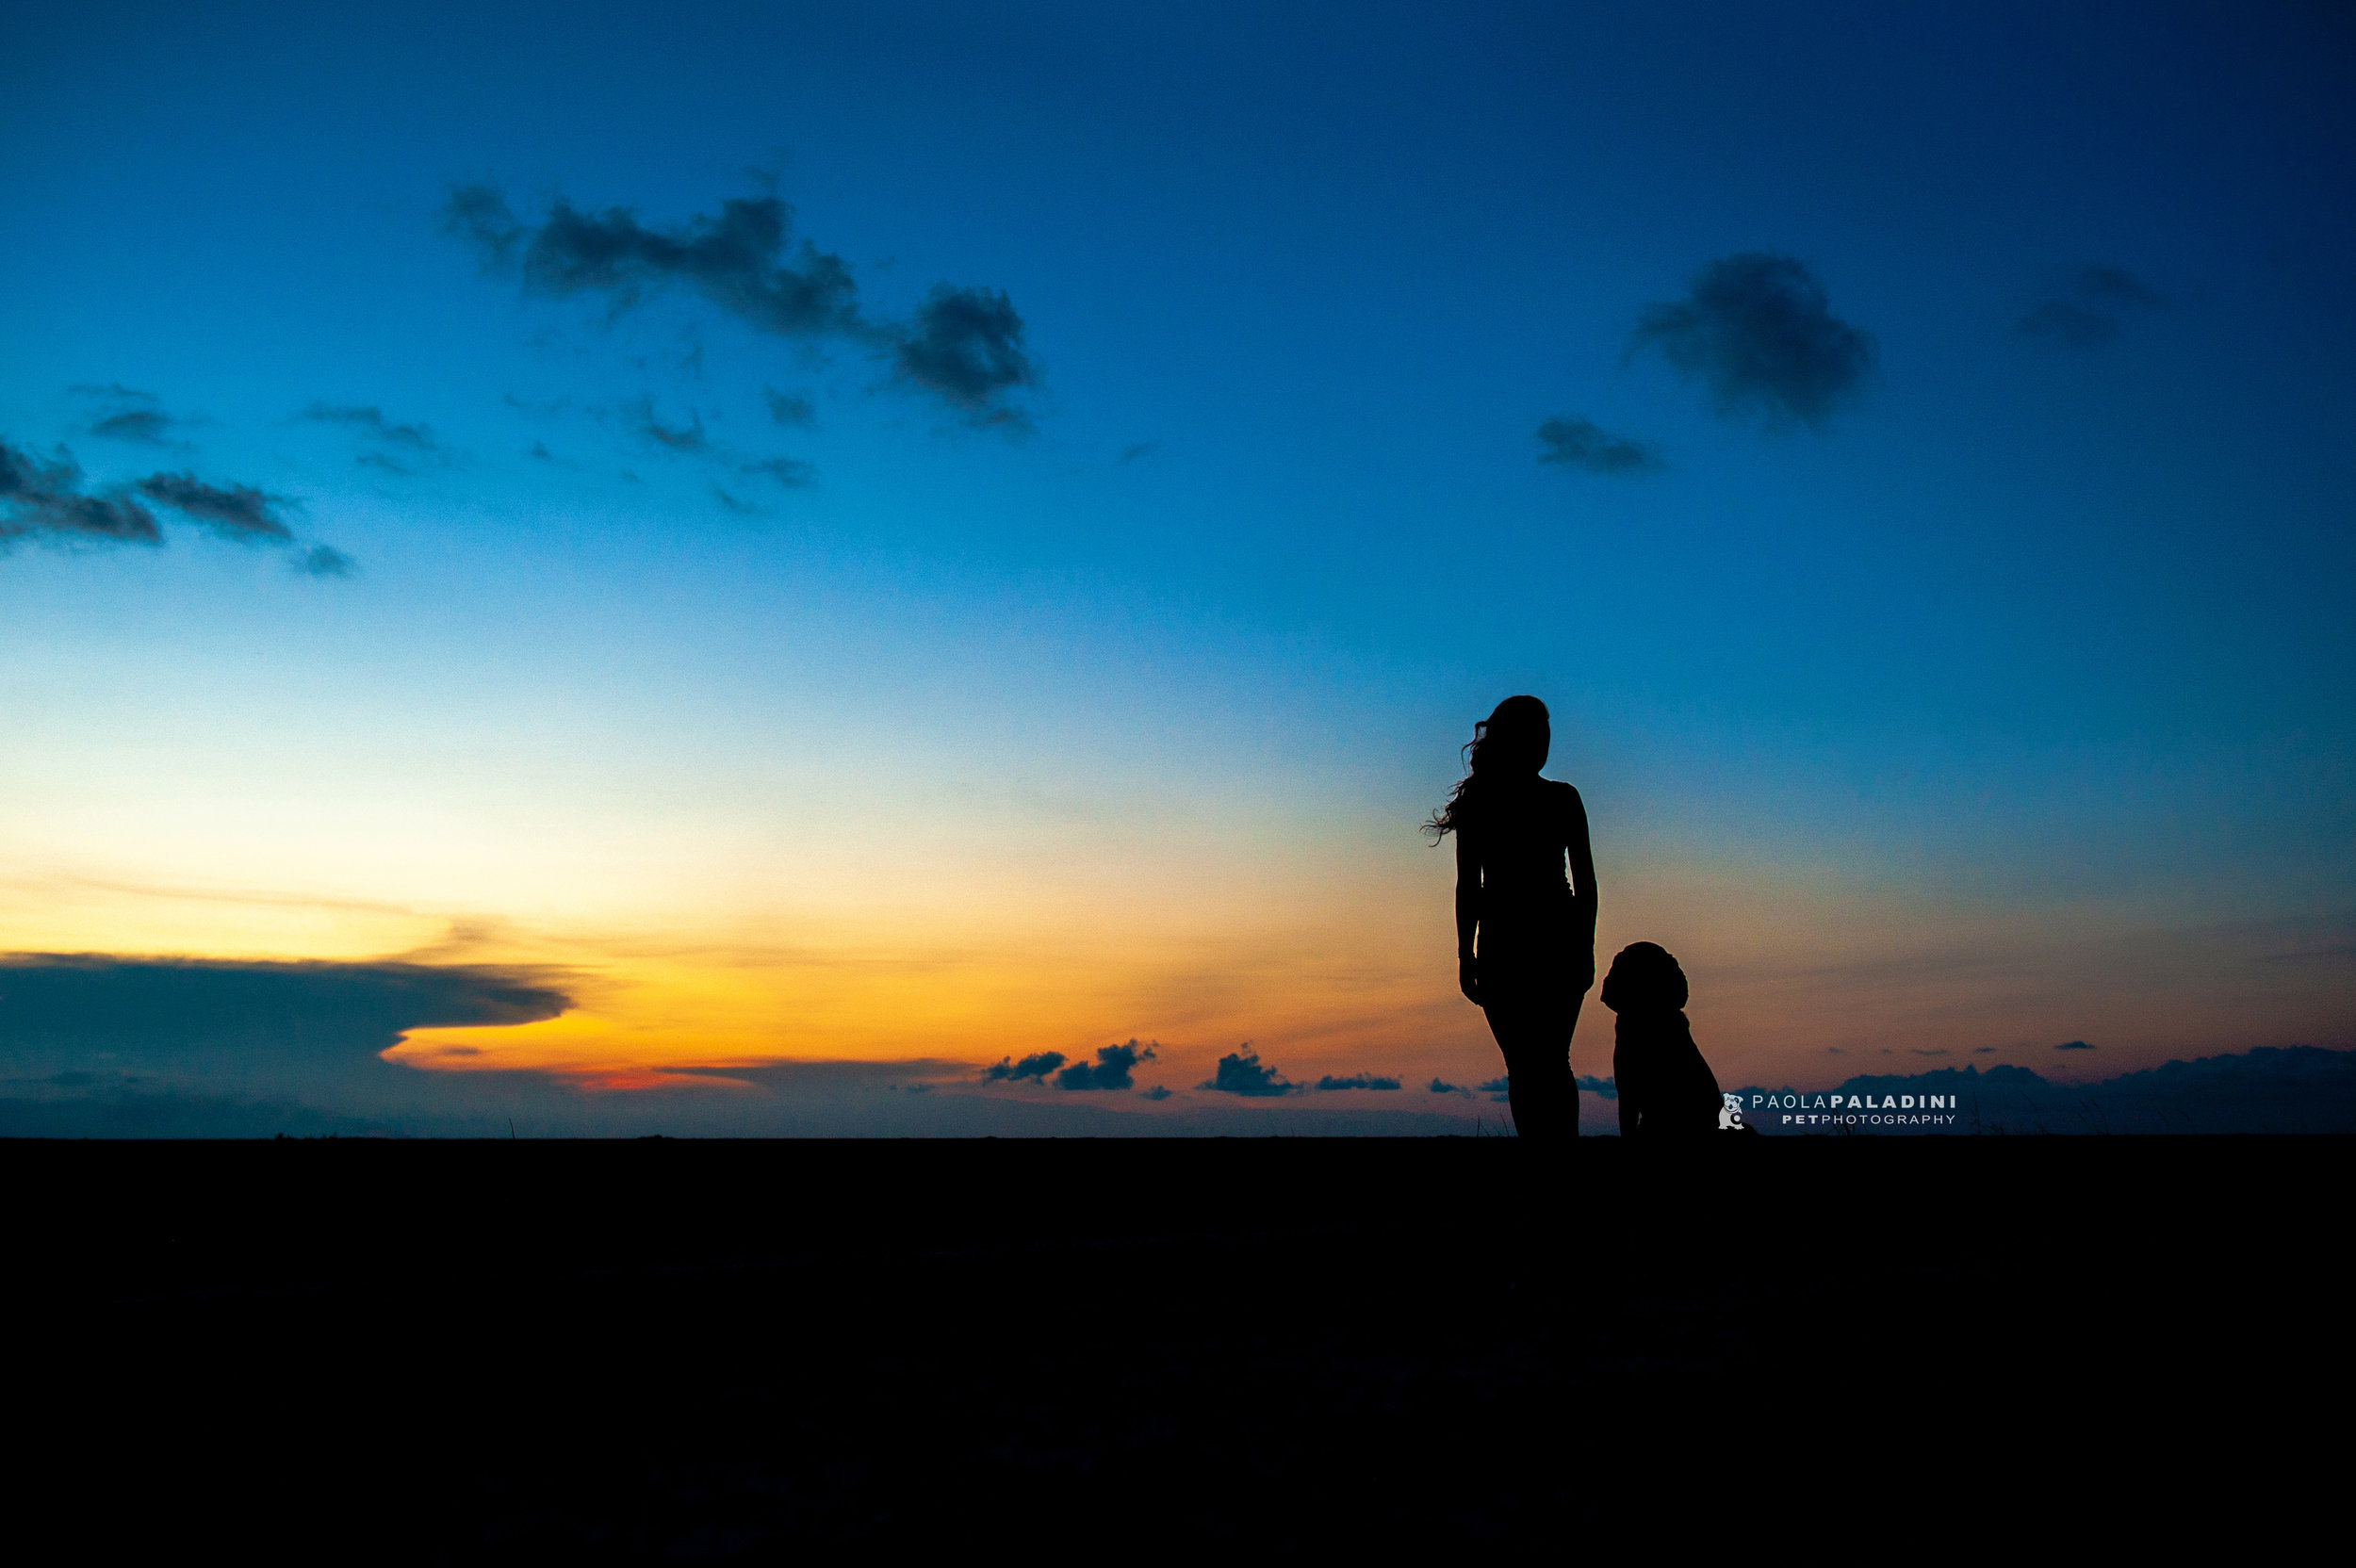 Paola-Paladini-Sunset-Silhouettes-Dog-Bloodhound-Three